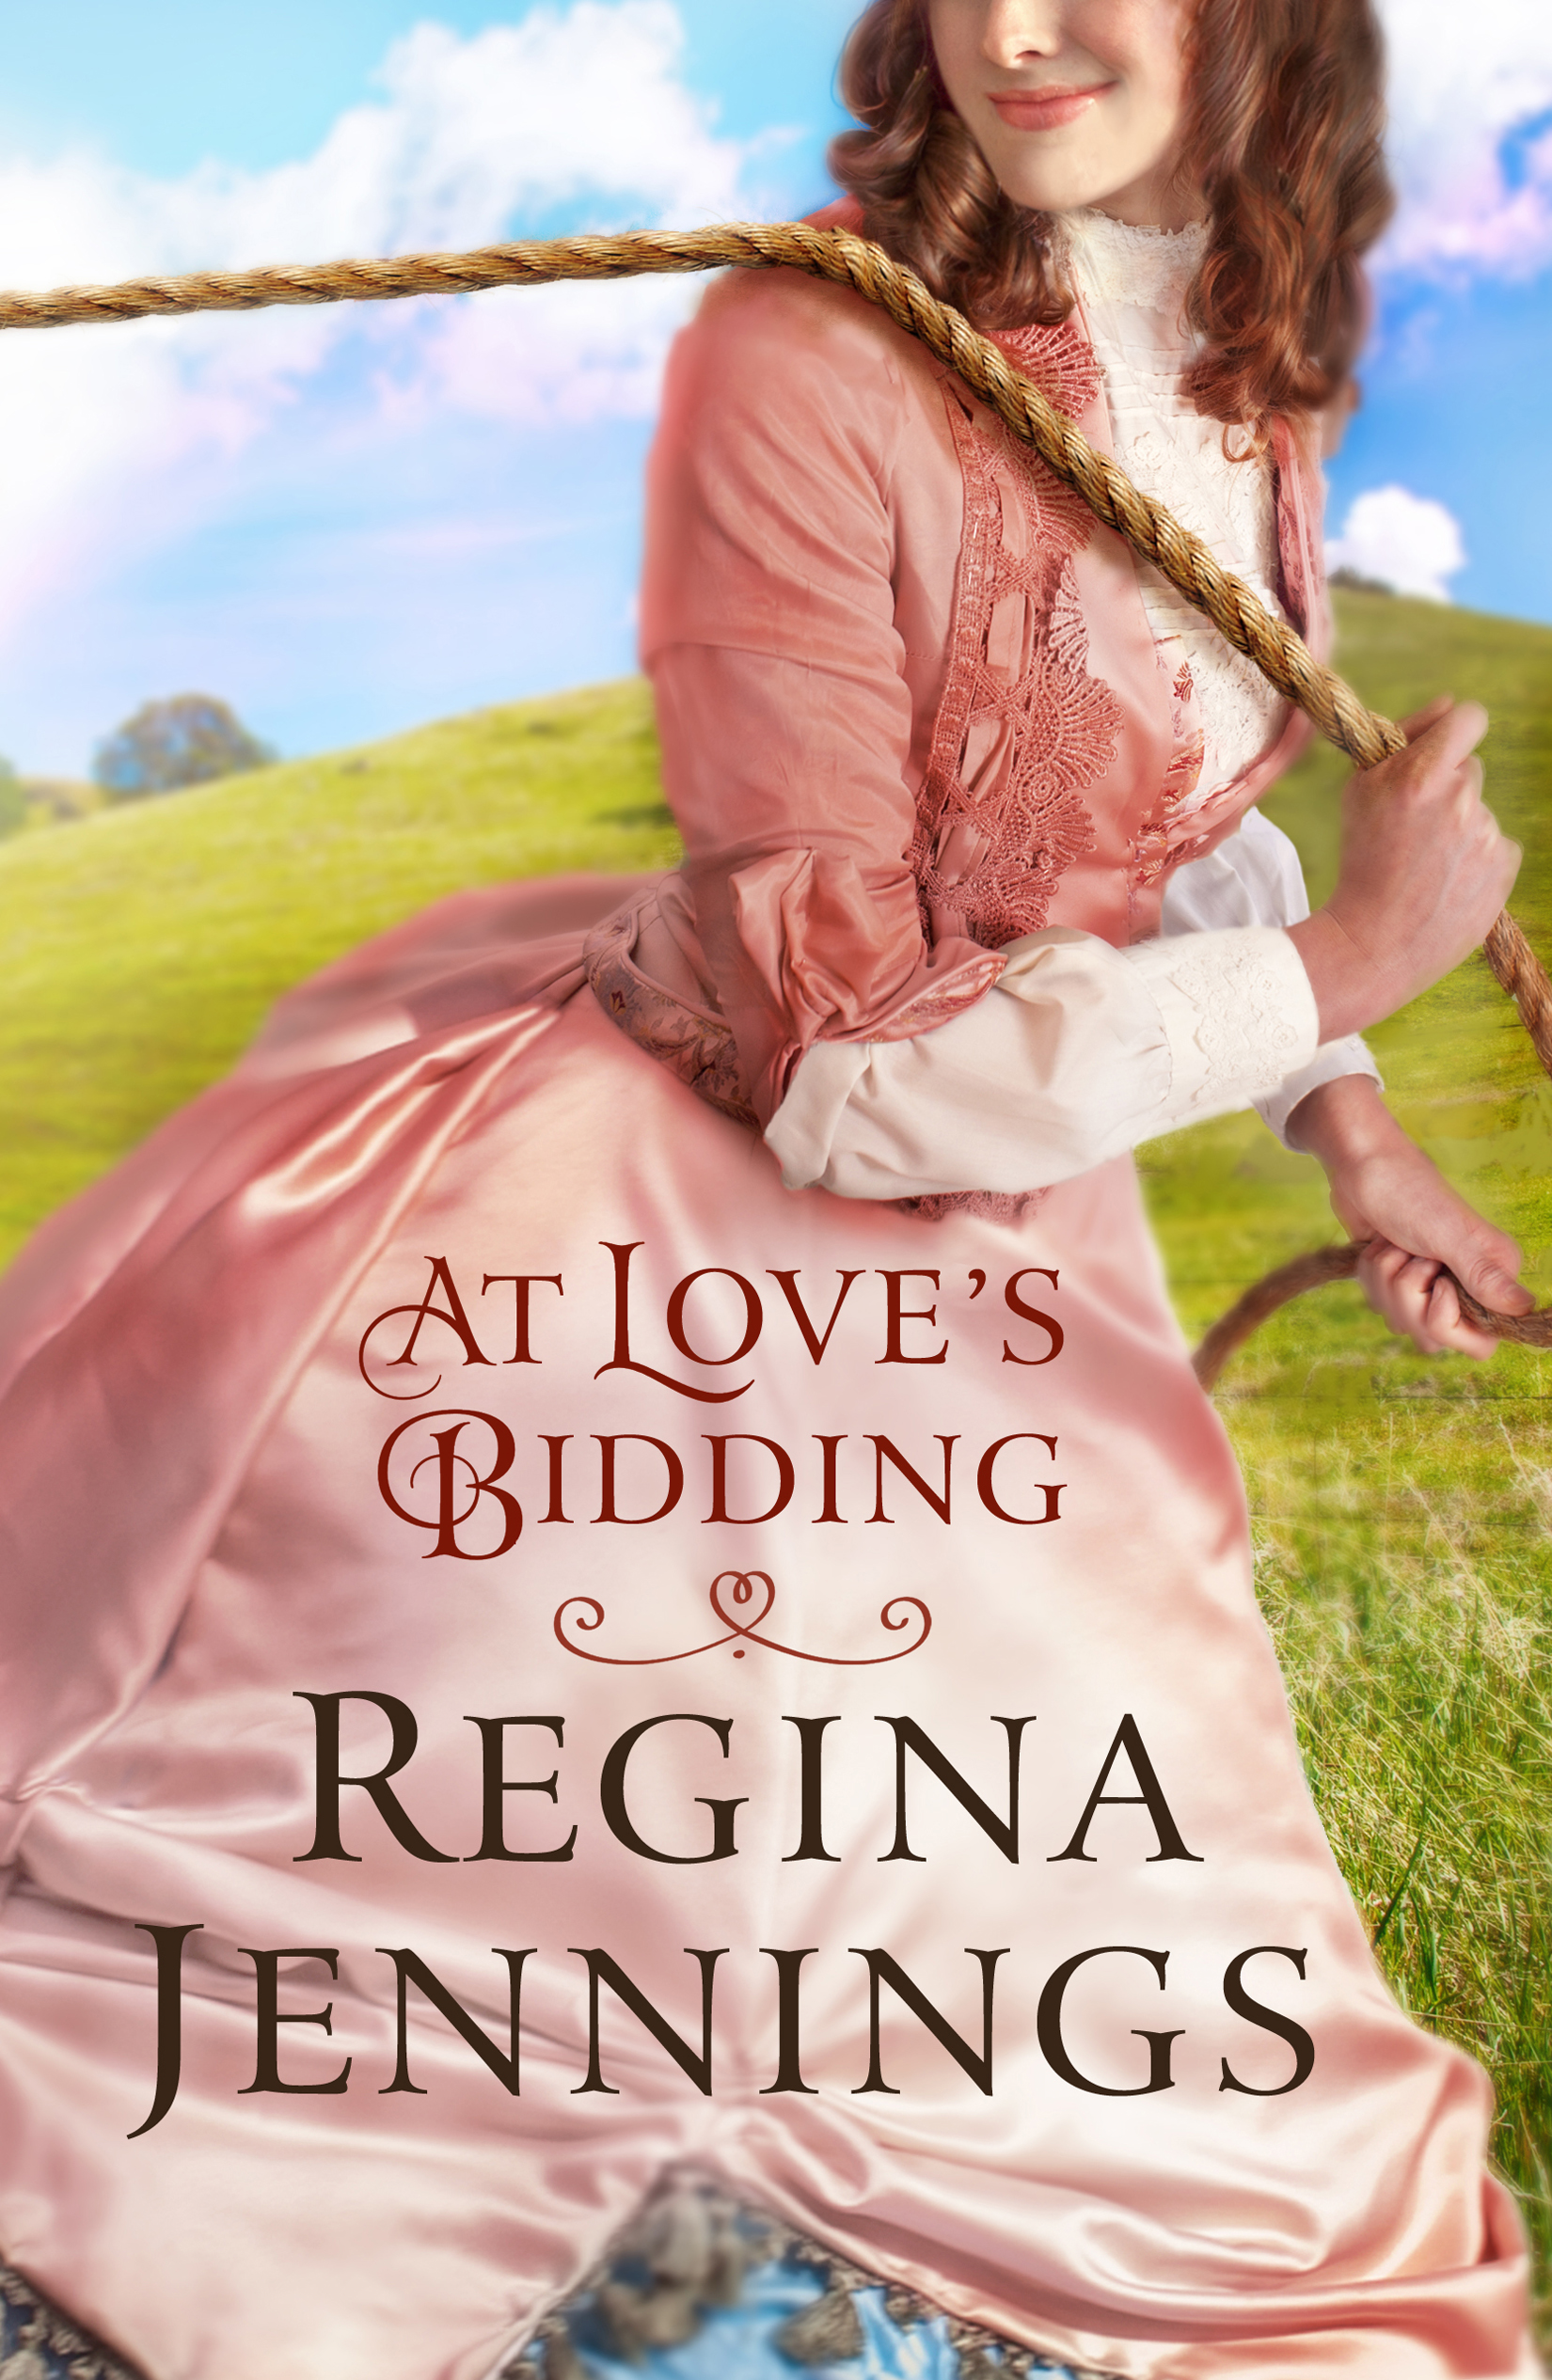 At Love's Bidding (Ozark Mountain Romance Book #2)